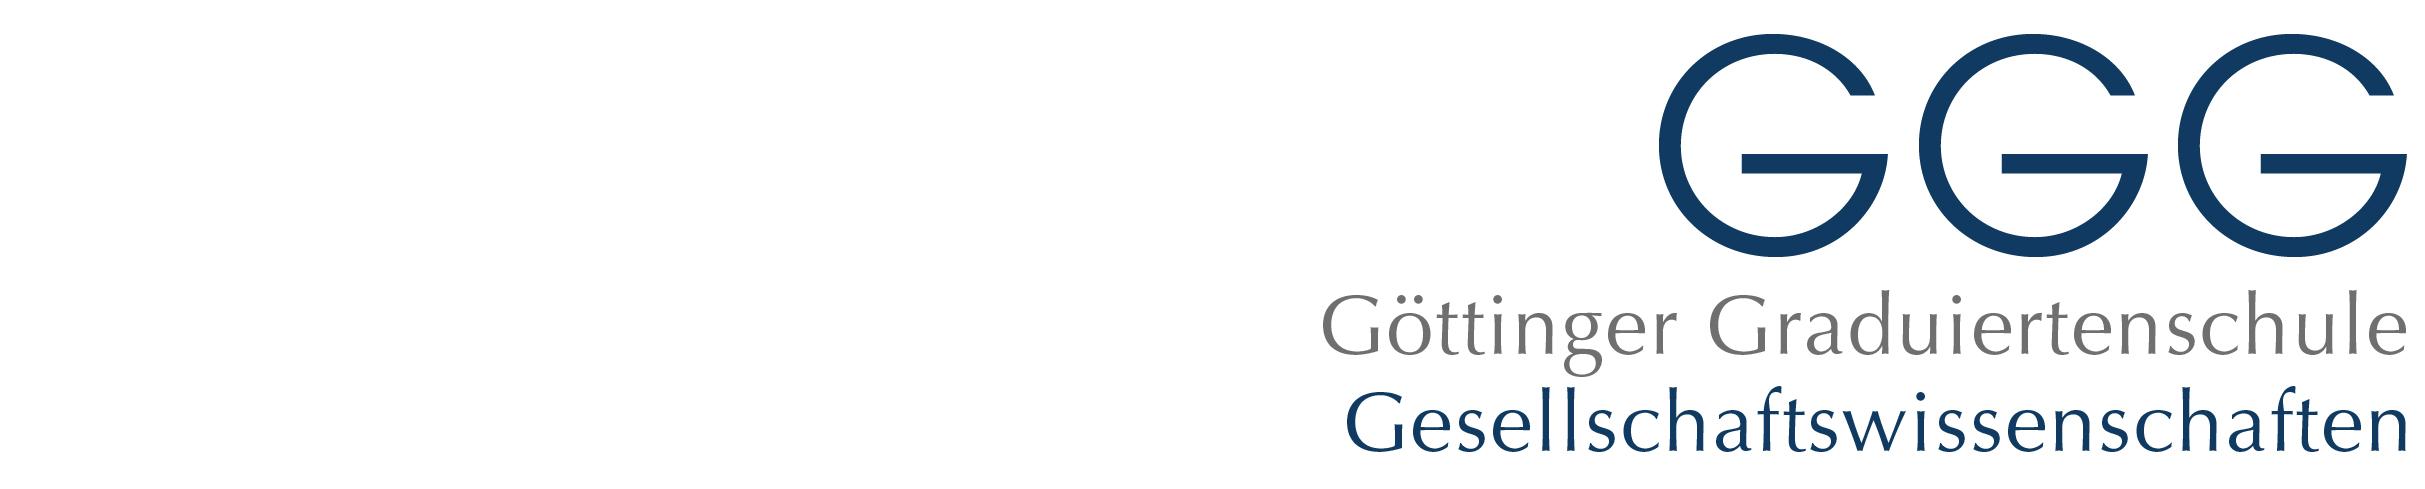 Göttinger Graduiertenschule Gesellschaftswissenschaften